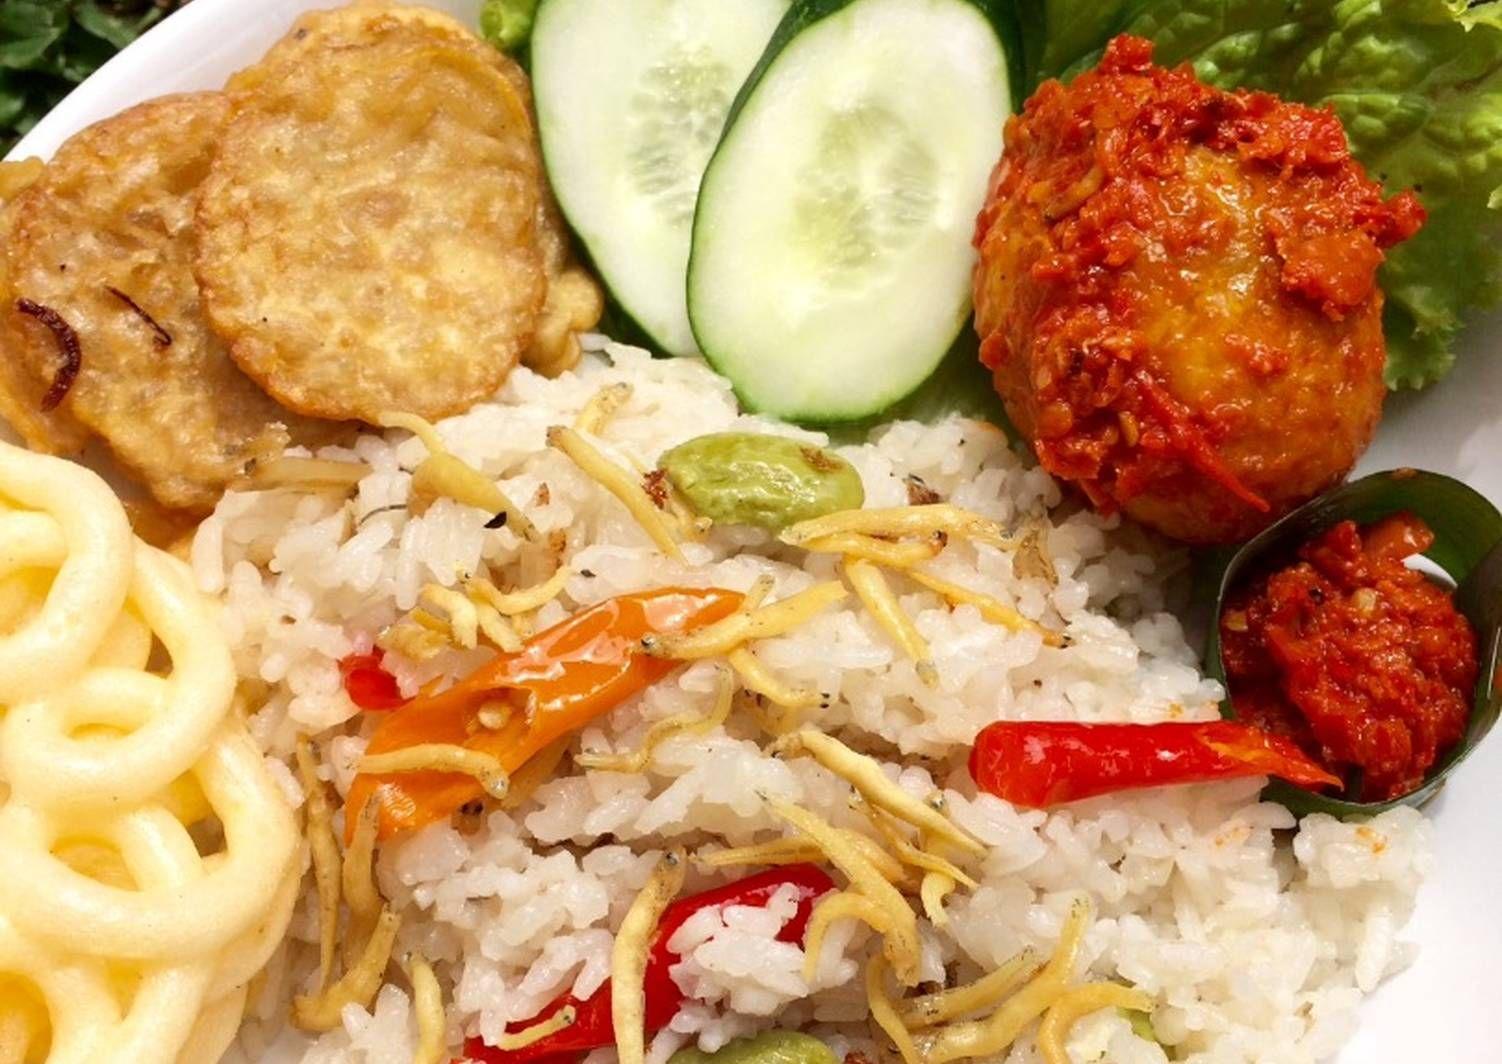 Resep Nasi Liwet Rice Cooker Oleh Melanii Resep Masakan Masakan Indonesia Resep Makanan